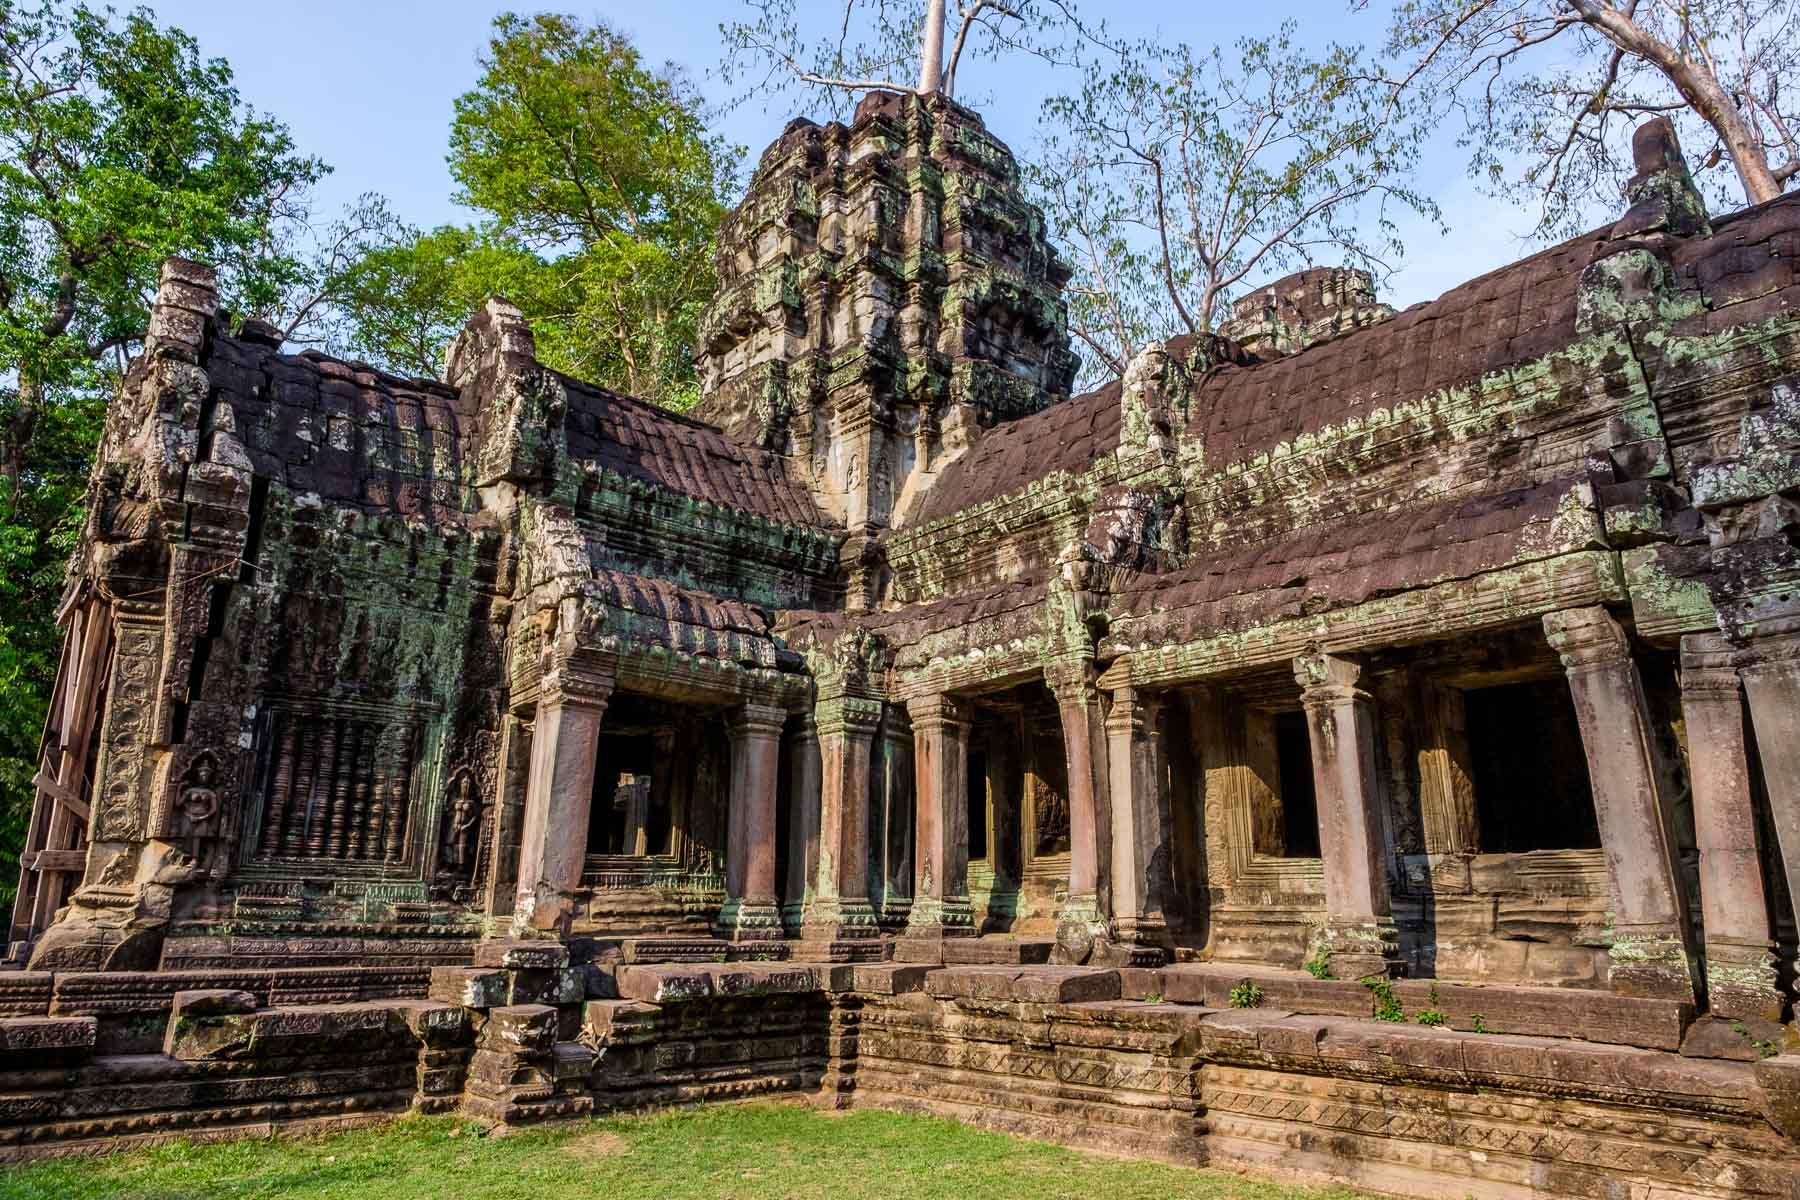 Ankor Thom Siem Reap Cambodia